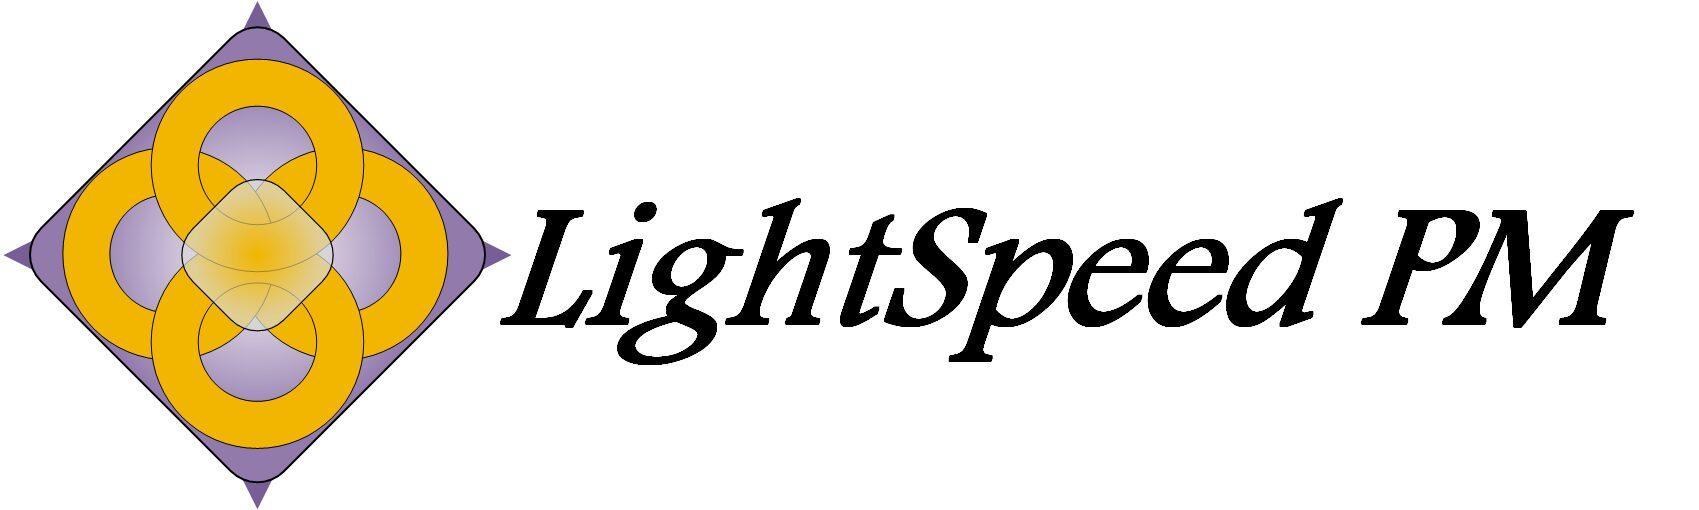 LightSpeed PM